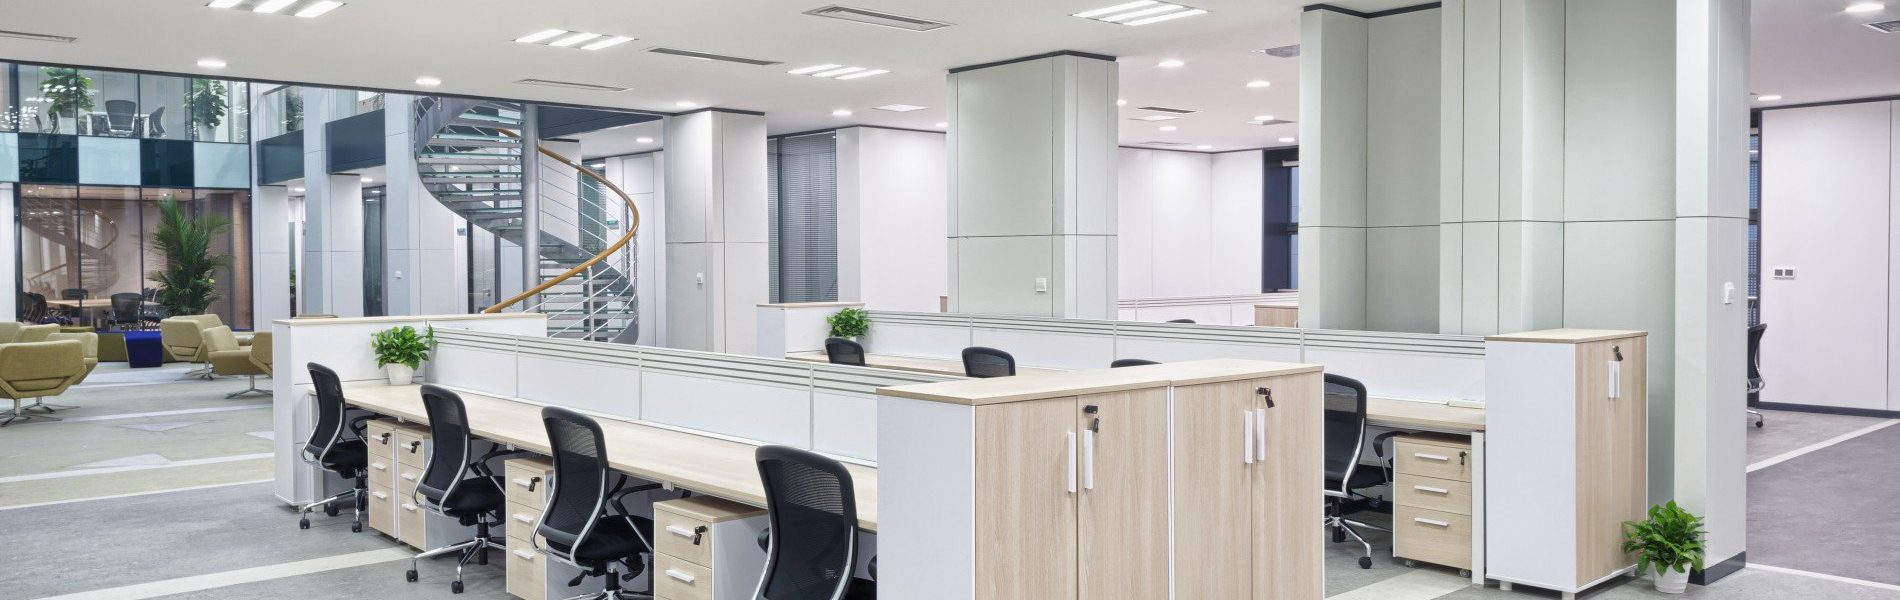 kantoorpand luchtbehandeling